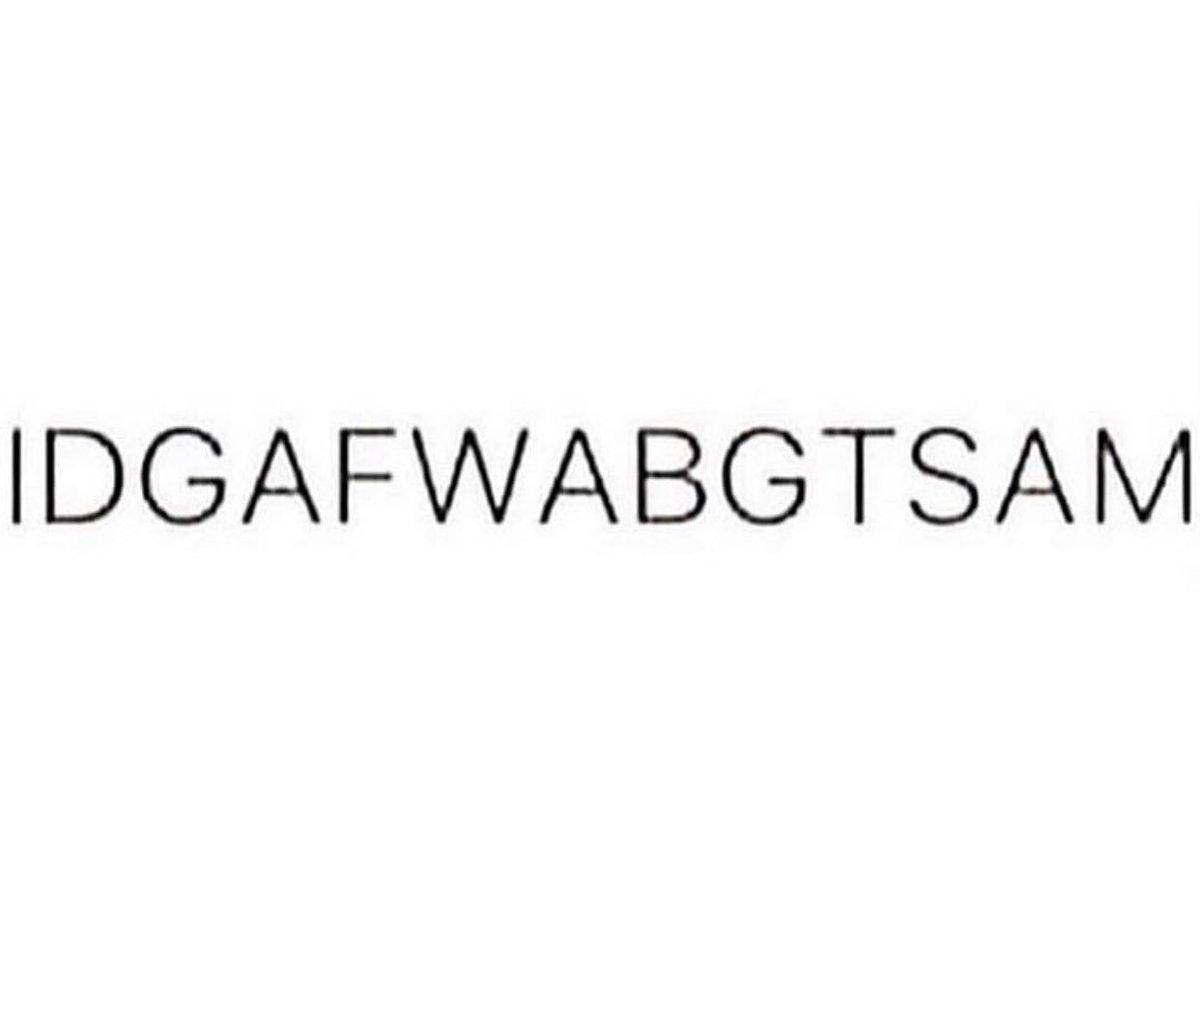 idgafwabgtsam hashtag on Twitter